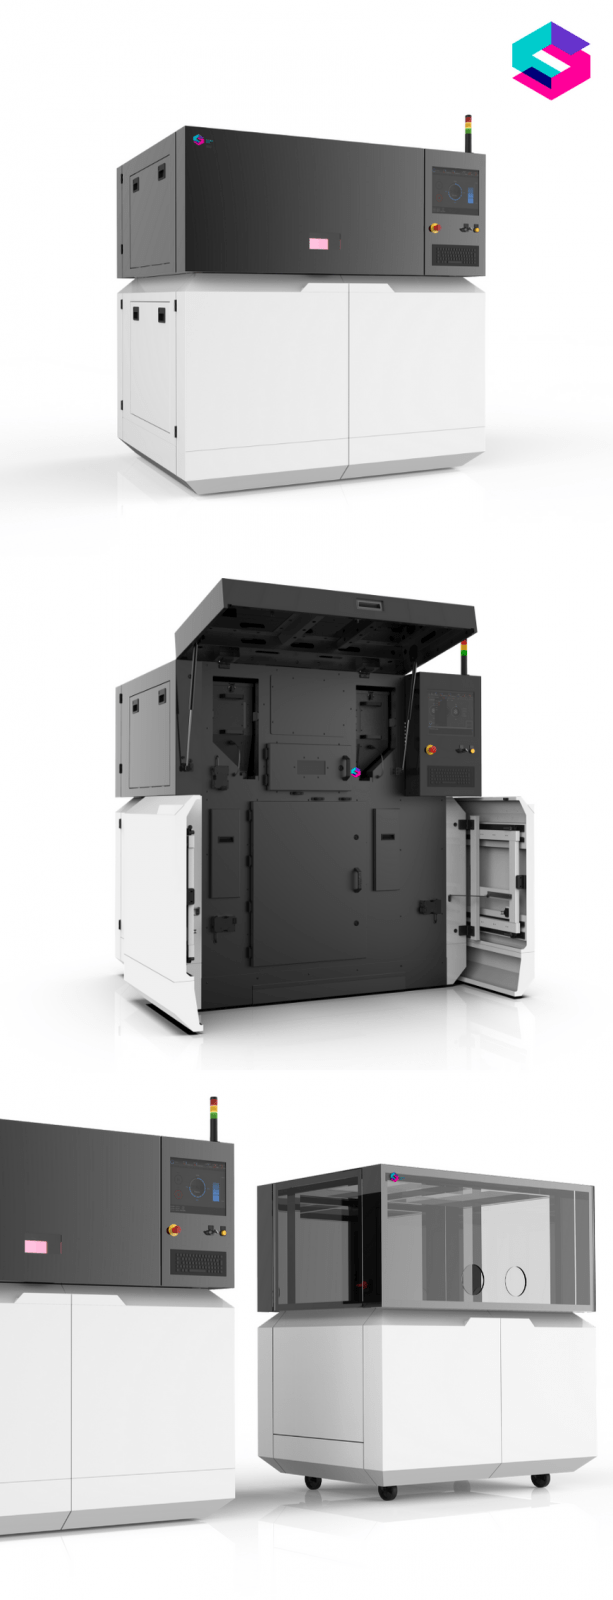 large-3d-printer-industrial-3d-printer